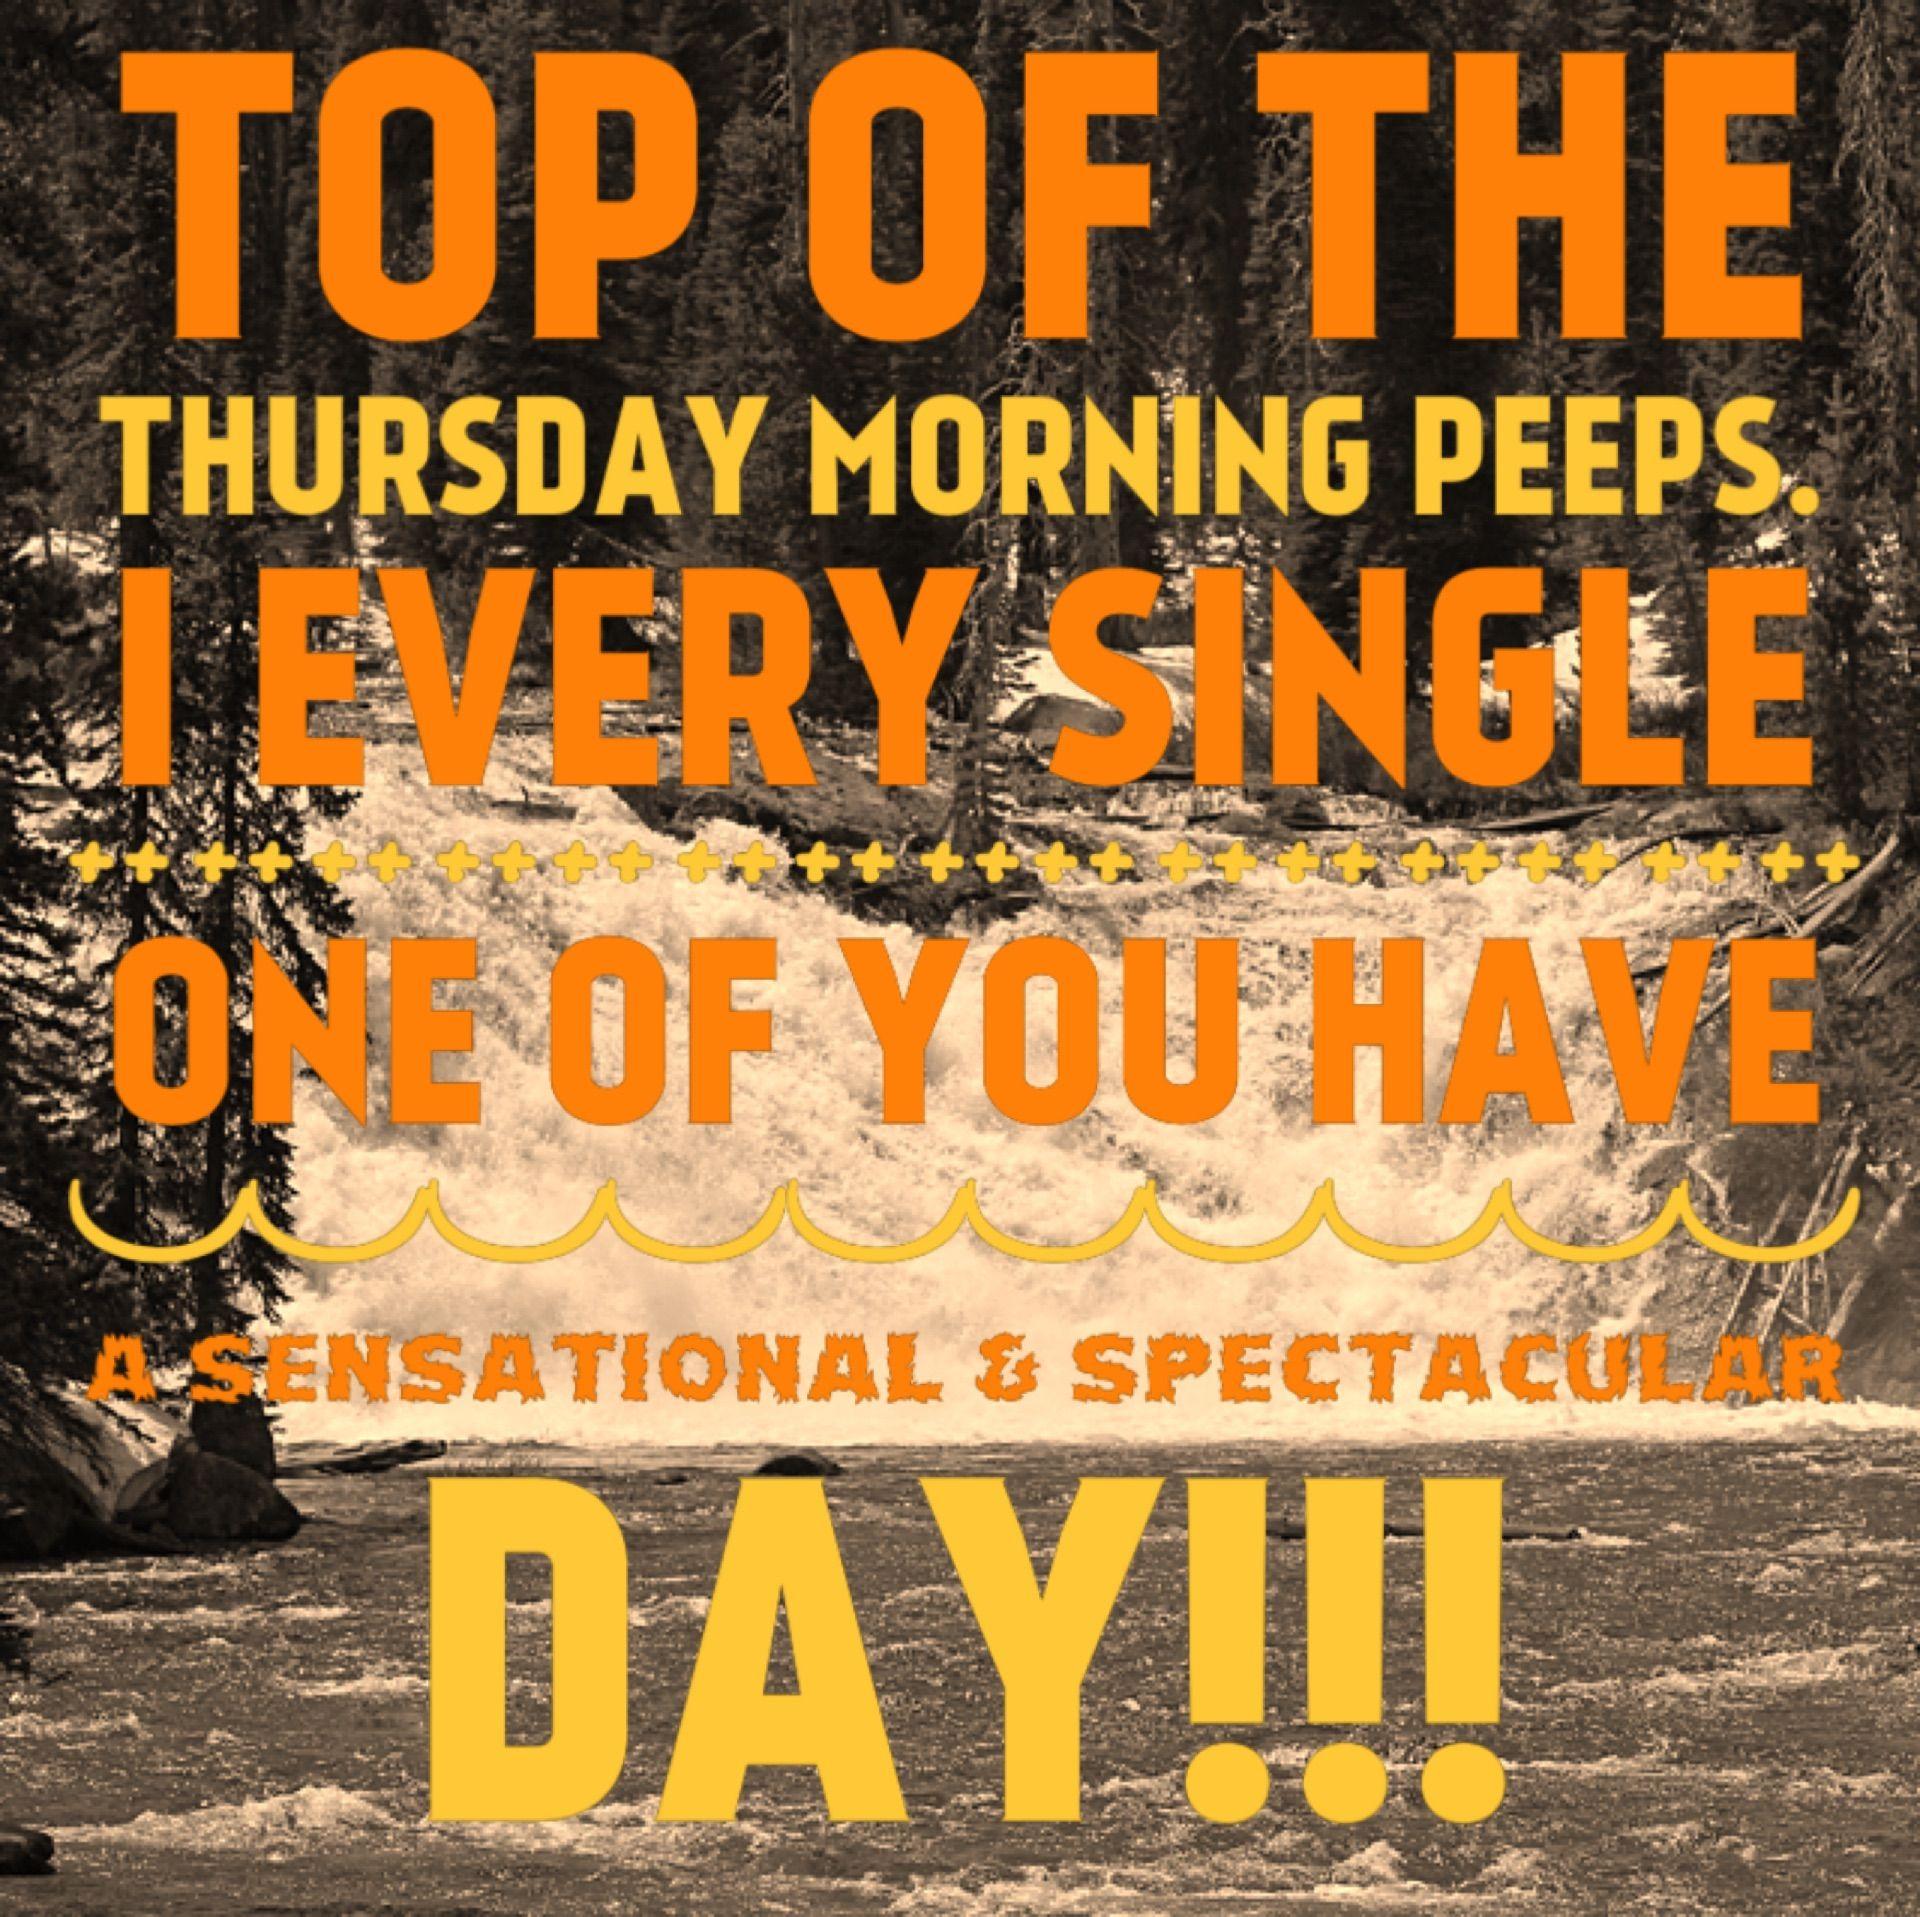 Top TheMorning Thursday Sensational Spectacular